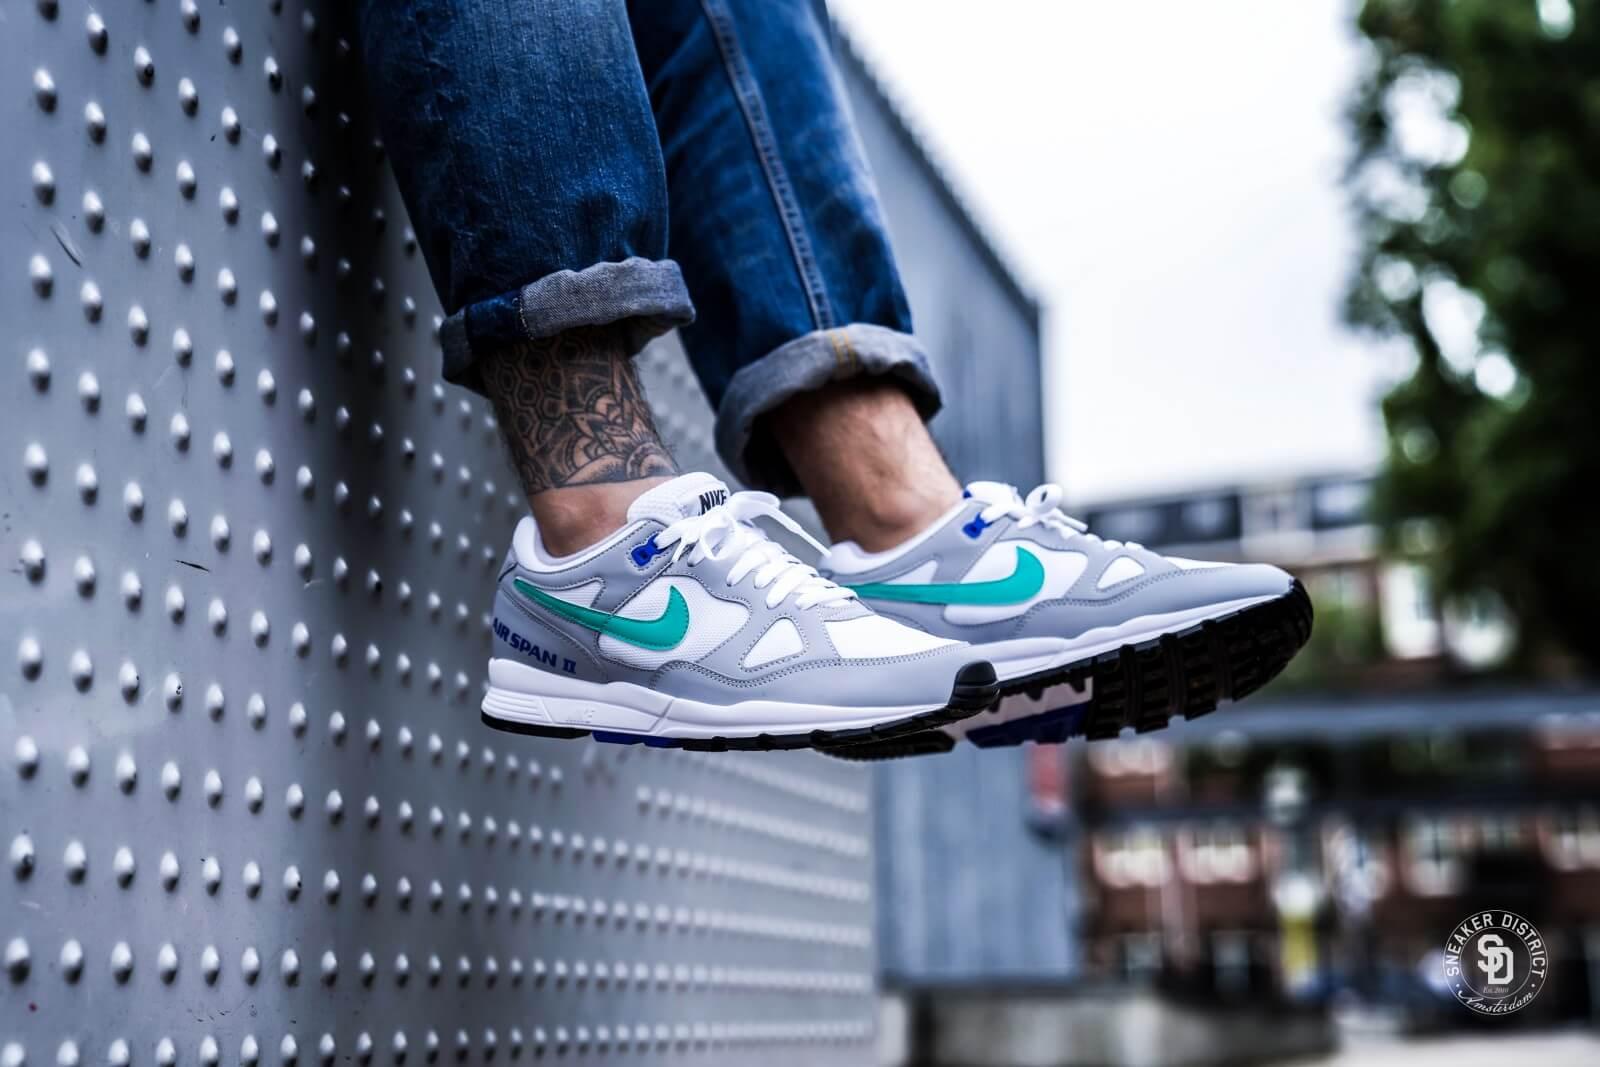 Inexpensive Nike Internationalist Clear 674ab Wolf Wmns Grå 9f93d c5jqAL4R3S